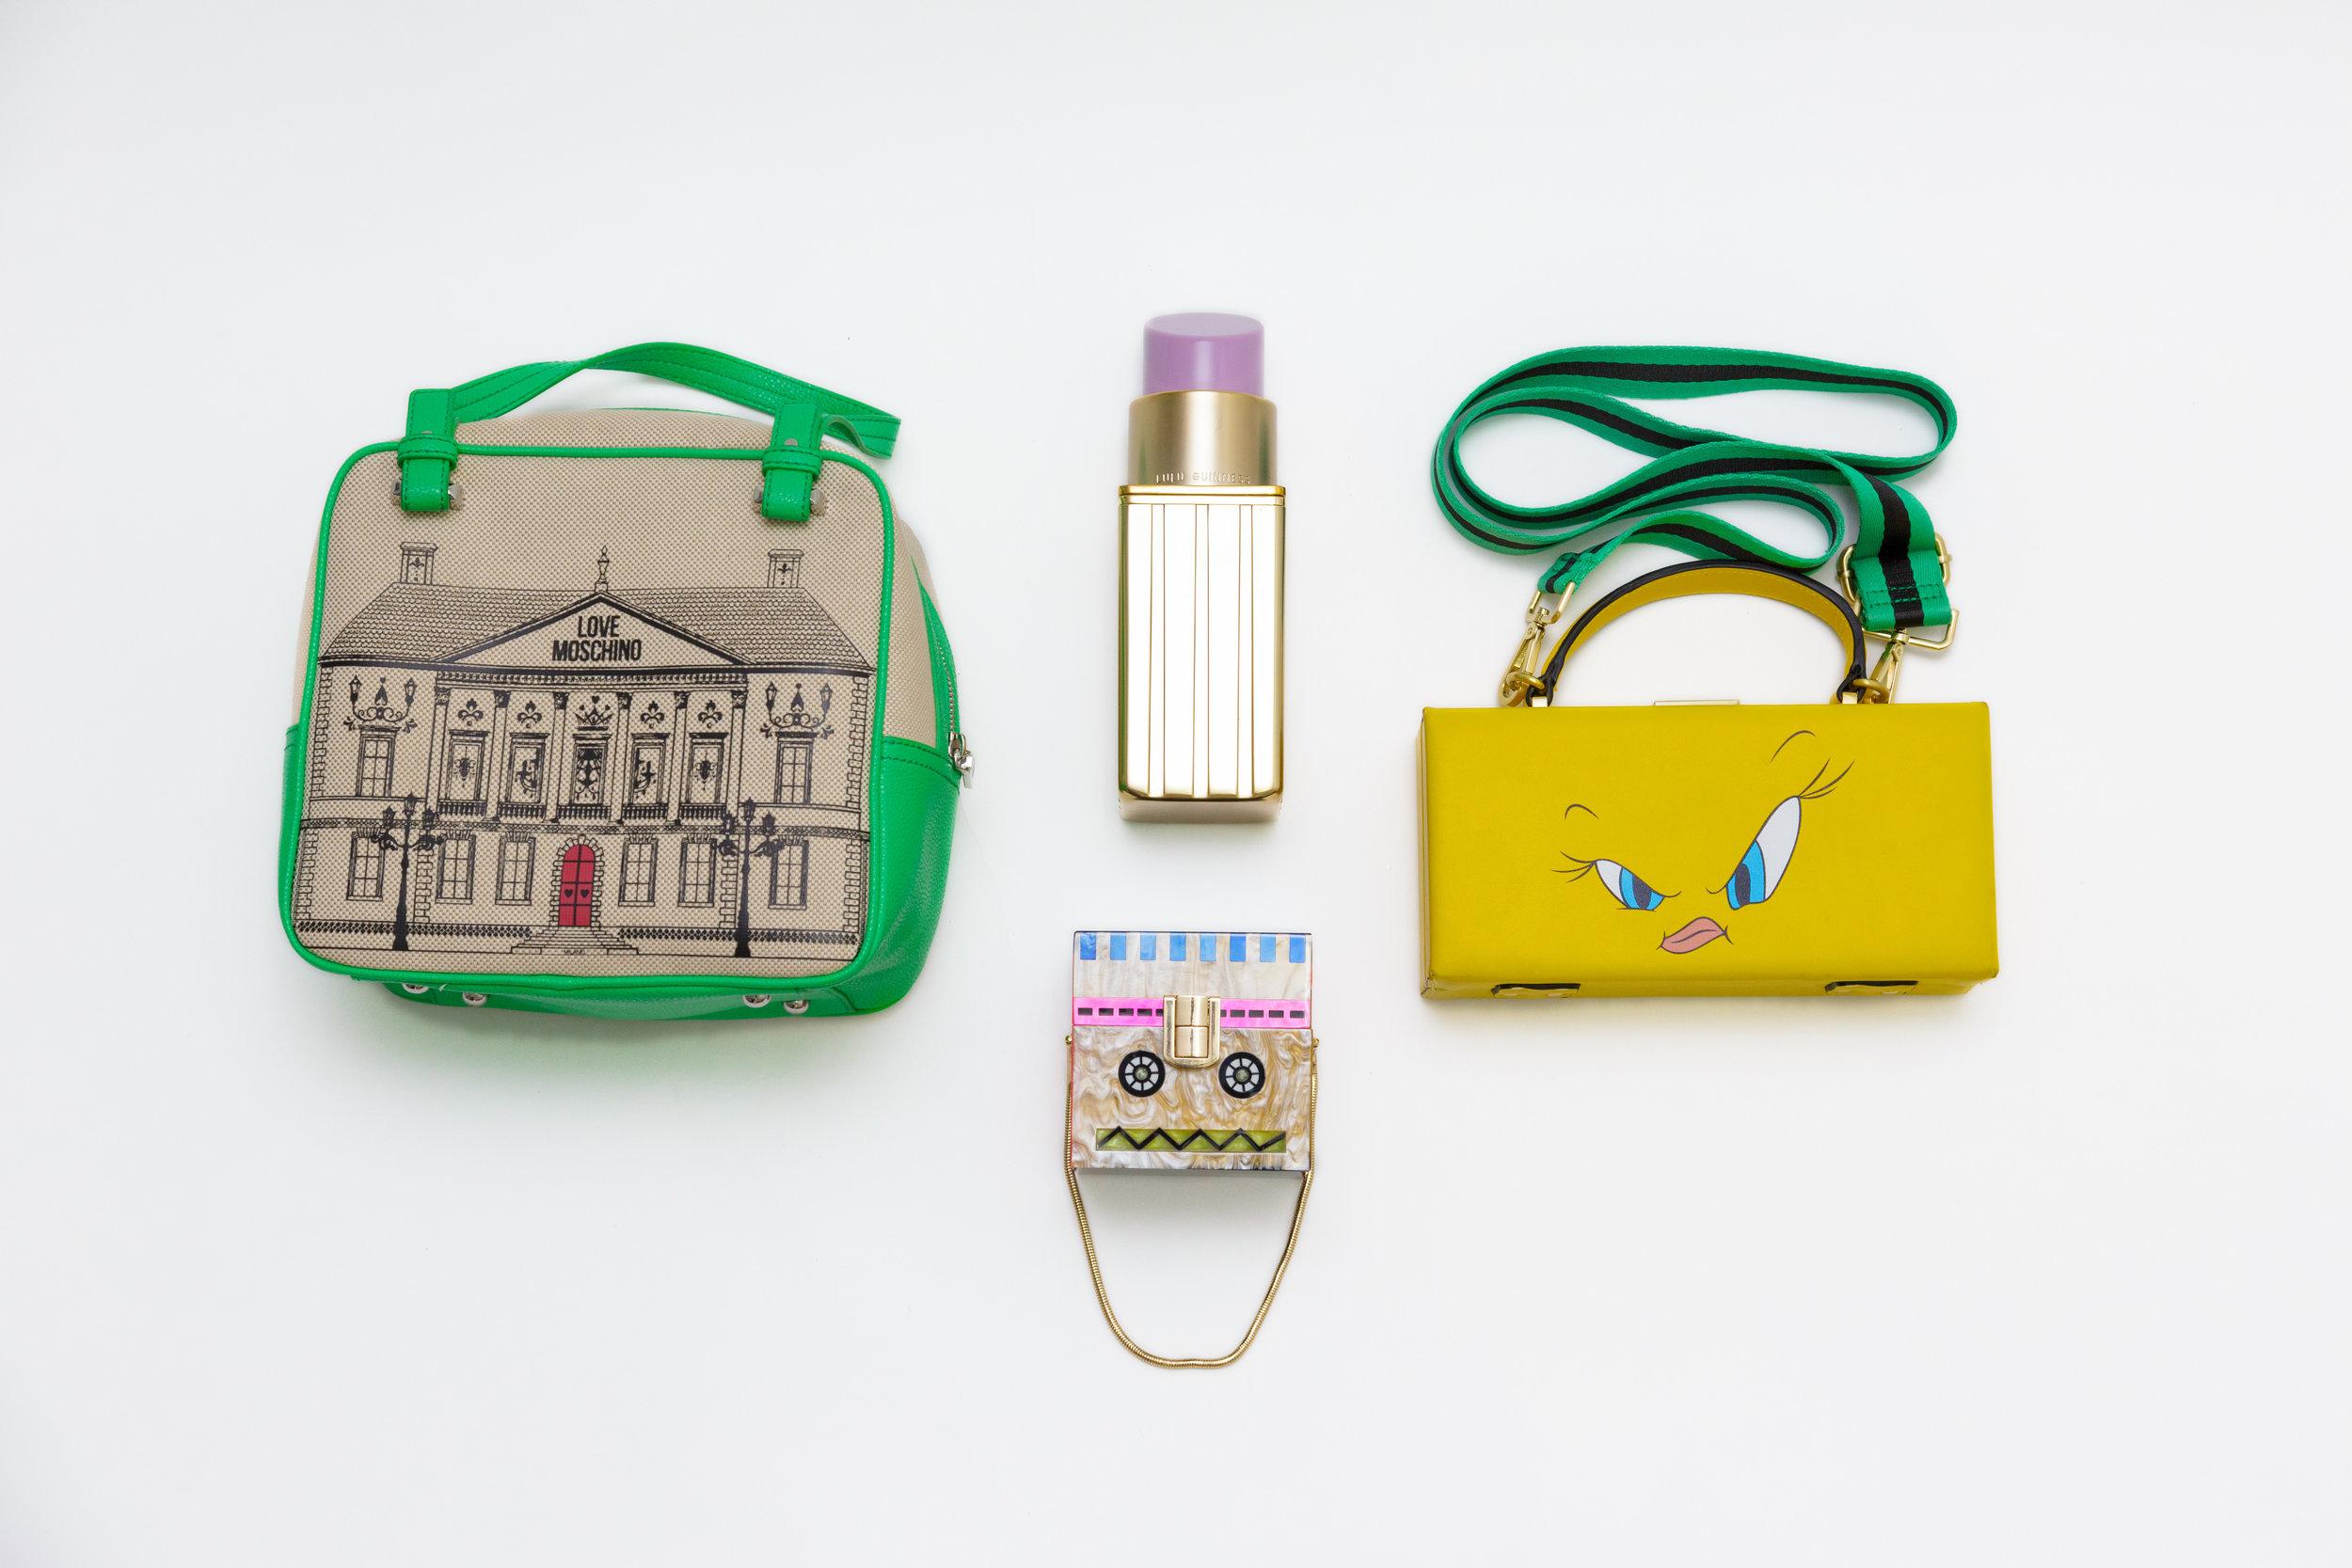 Love Moschino Handbag |    Moschino    (similar), Lipstick Clutch |    Lulu Guiness    (similar), Tweety Bird Guitar Strap Bag | Zara (sold out), Robot Box Clutch | Zara (sold out)